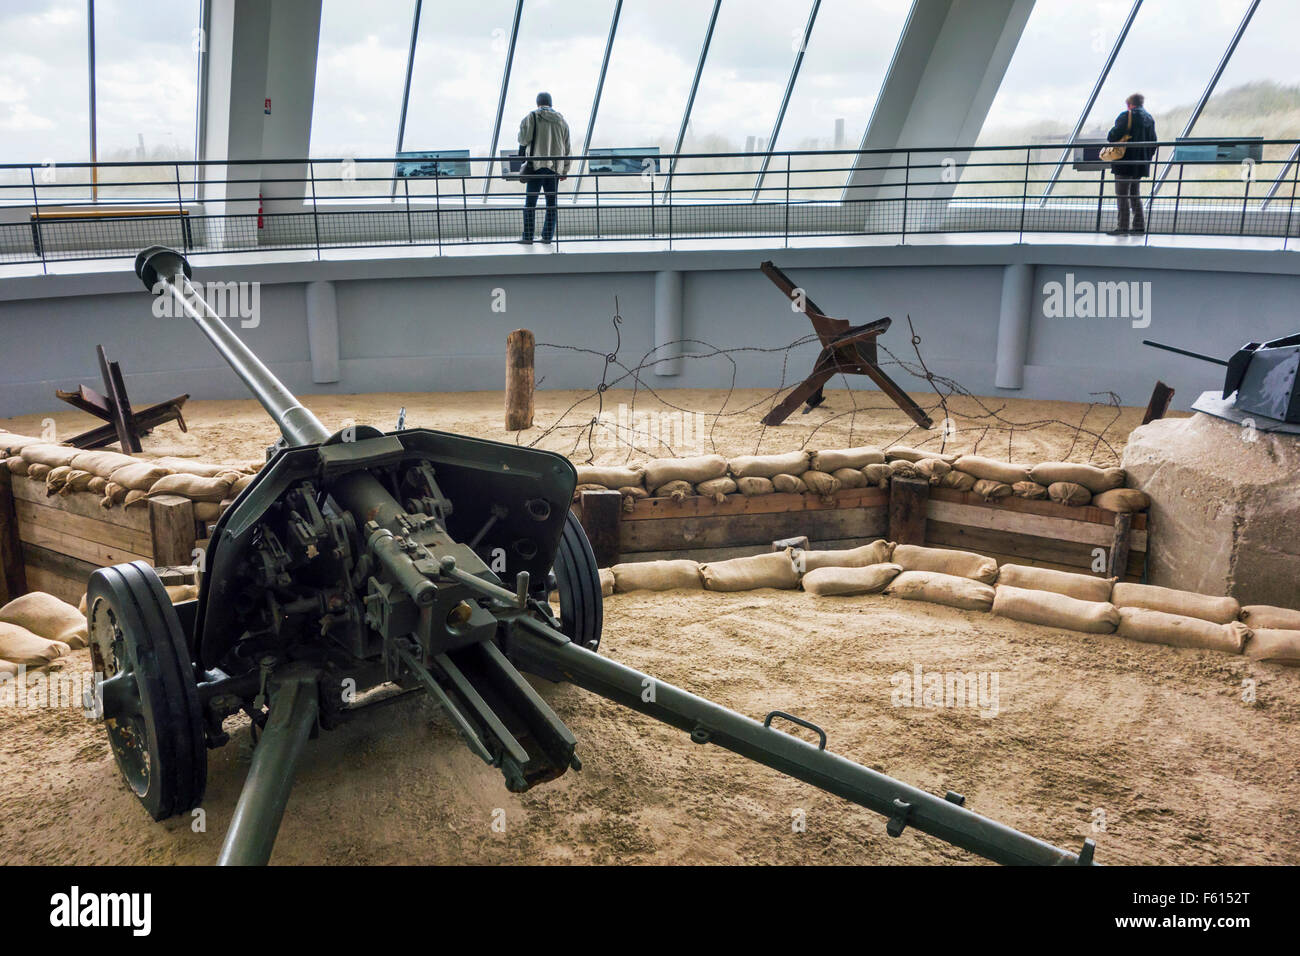 German 50 Mm Anti Tank Gun: German Pak 40 75 Mm Anti-tank Gun In The Musée Du